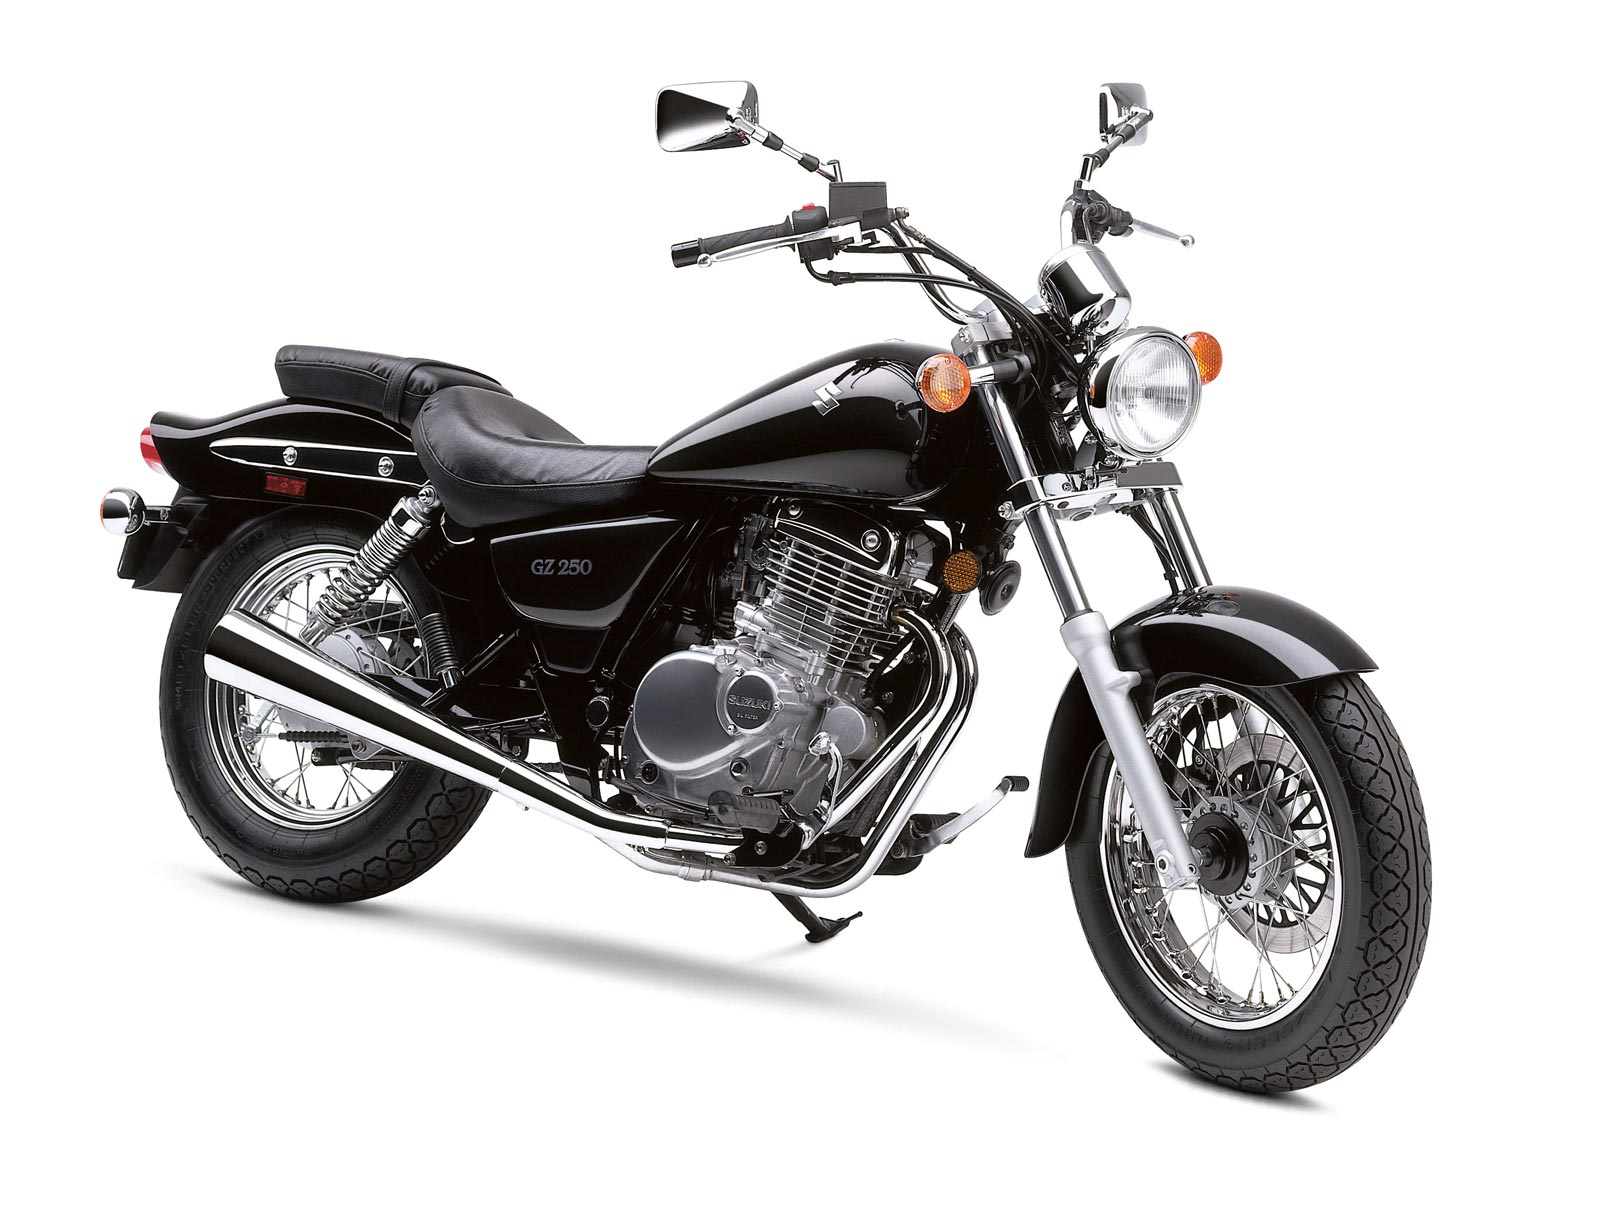 suzuki gz250 marauder specs 2007 2008 autoevolution rh autoevolution com manual de usuario suzuki gz 150 2014 Suzuki Motorcycles